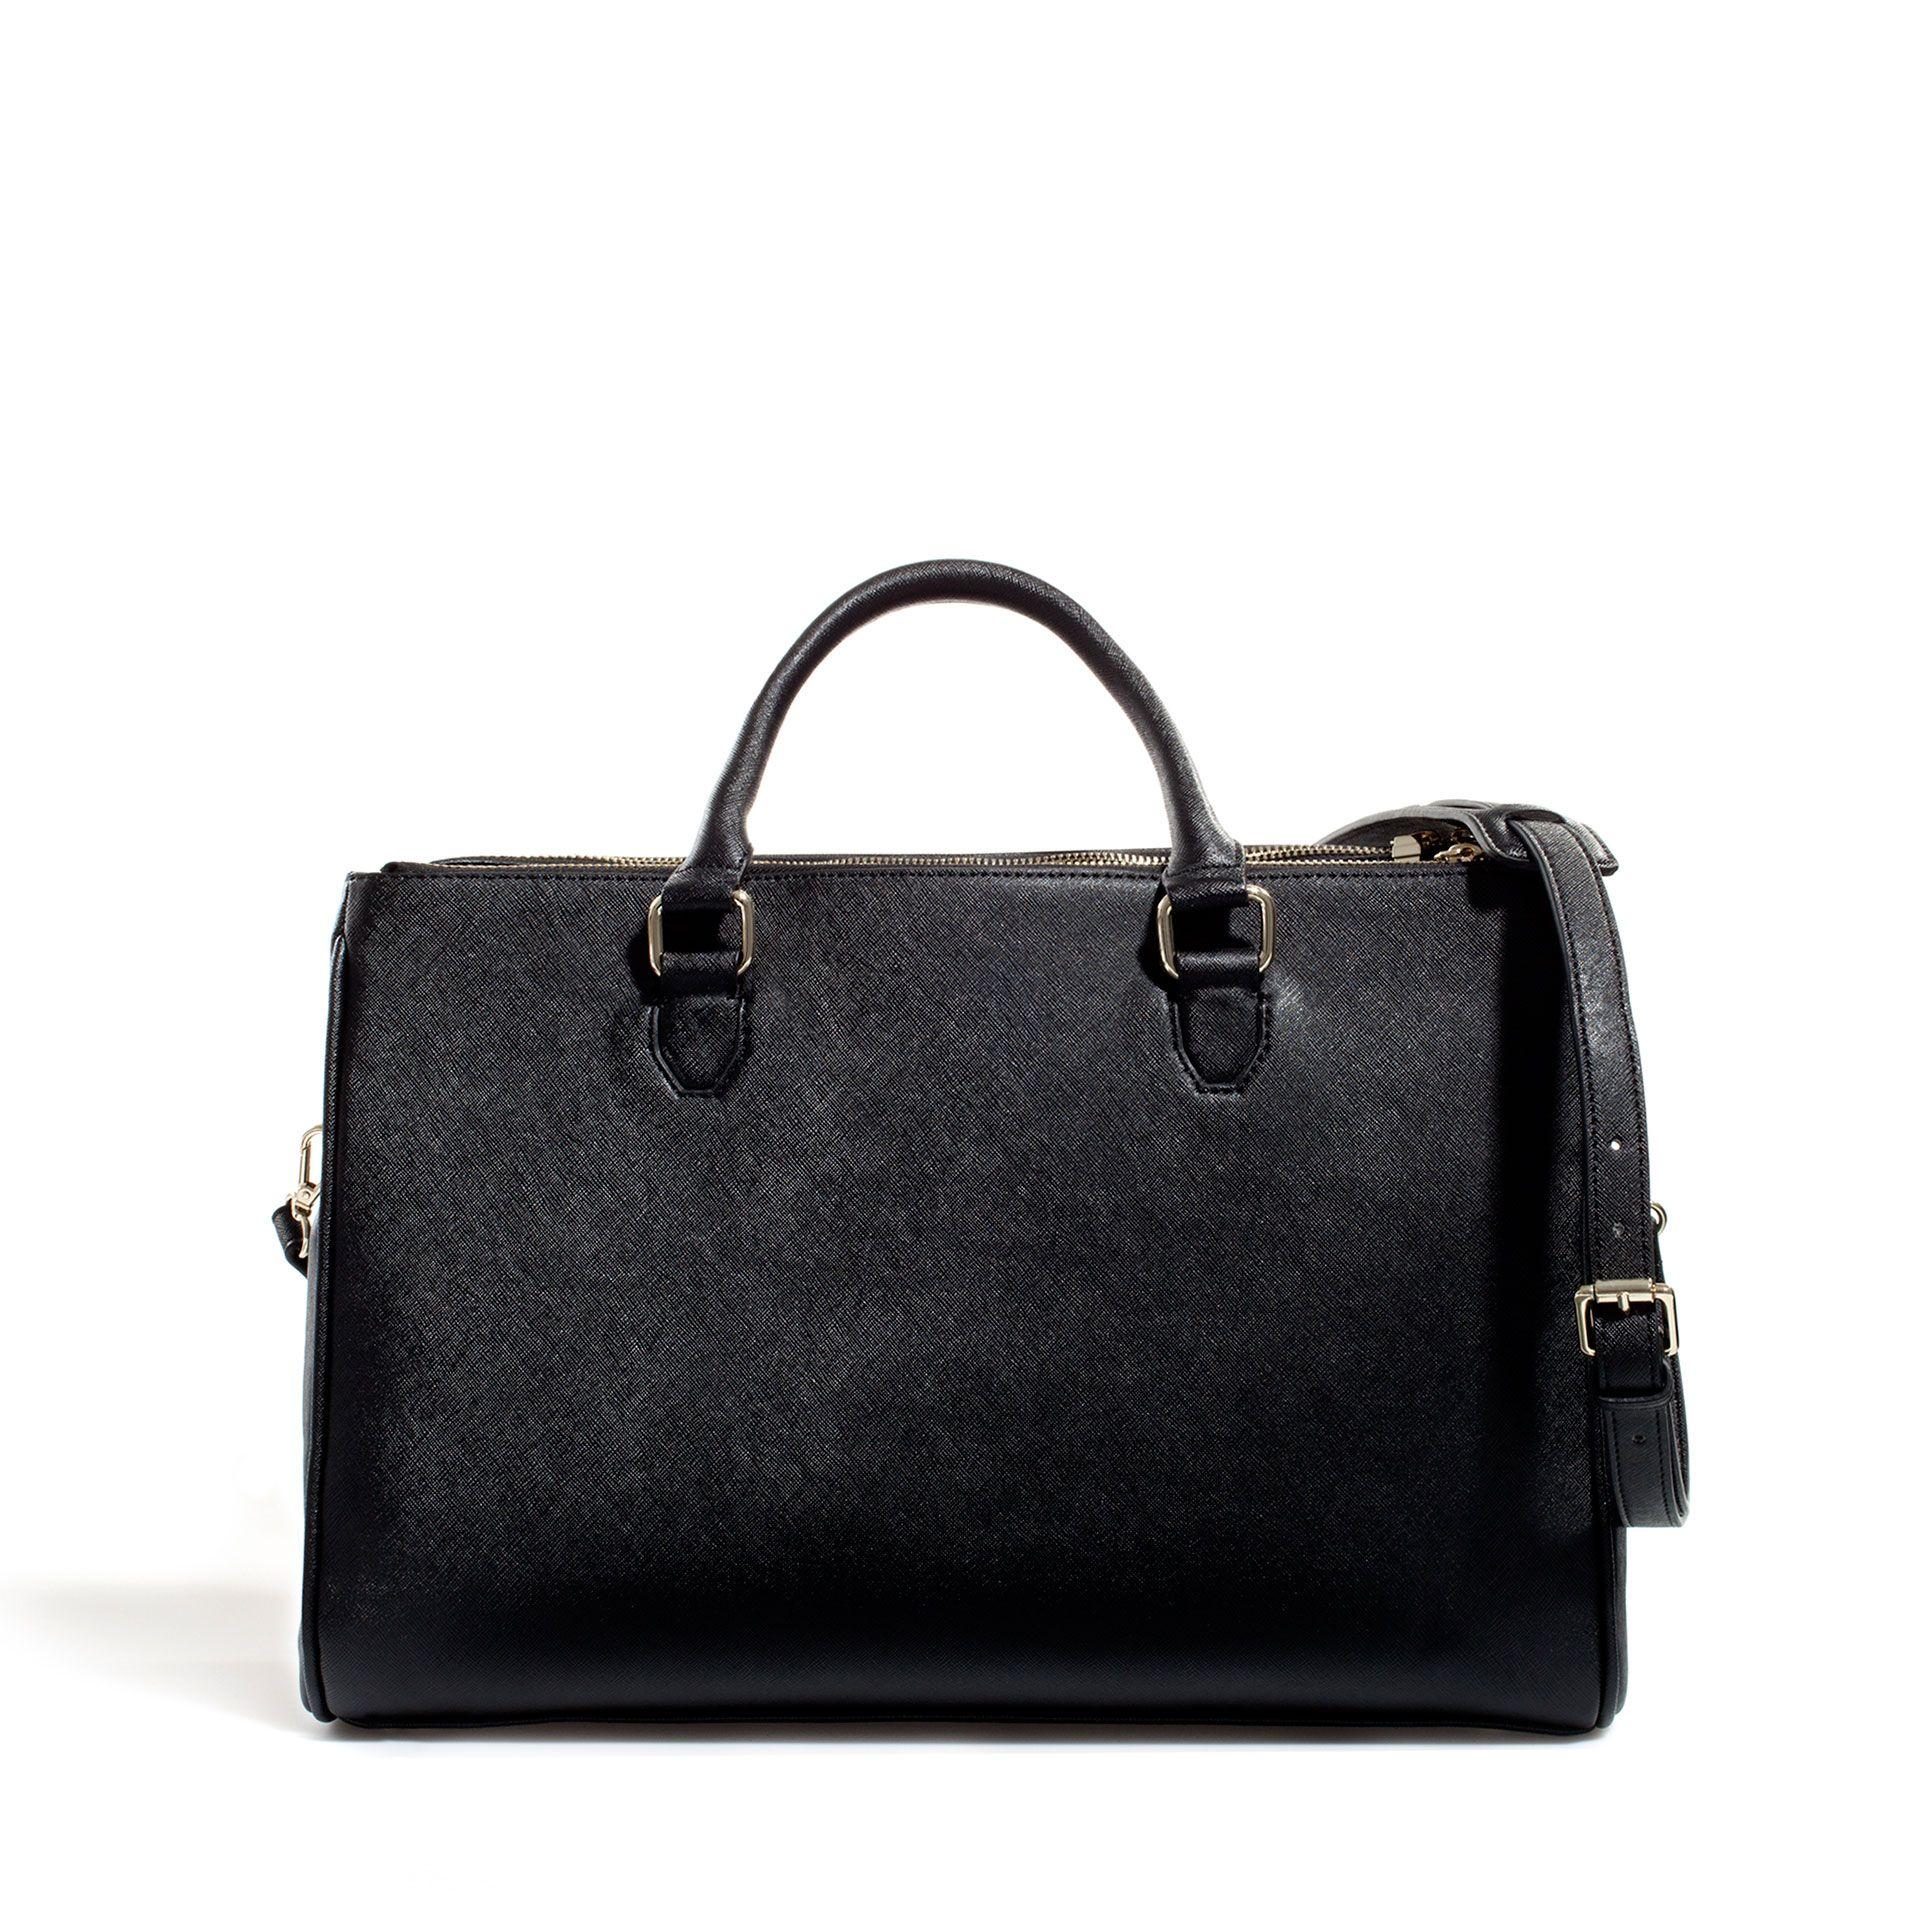 3f12765d08 OFFICE CITY BAG - Handbags - Woman - ZARA United Kingdom   Fashion ...